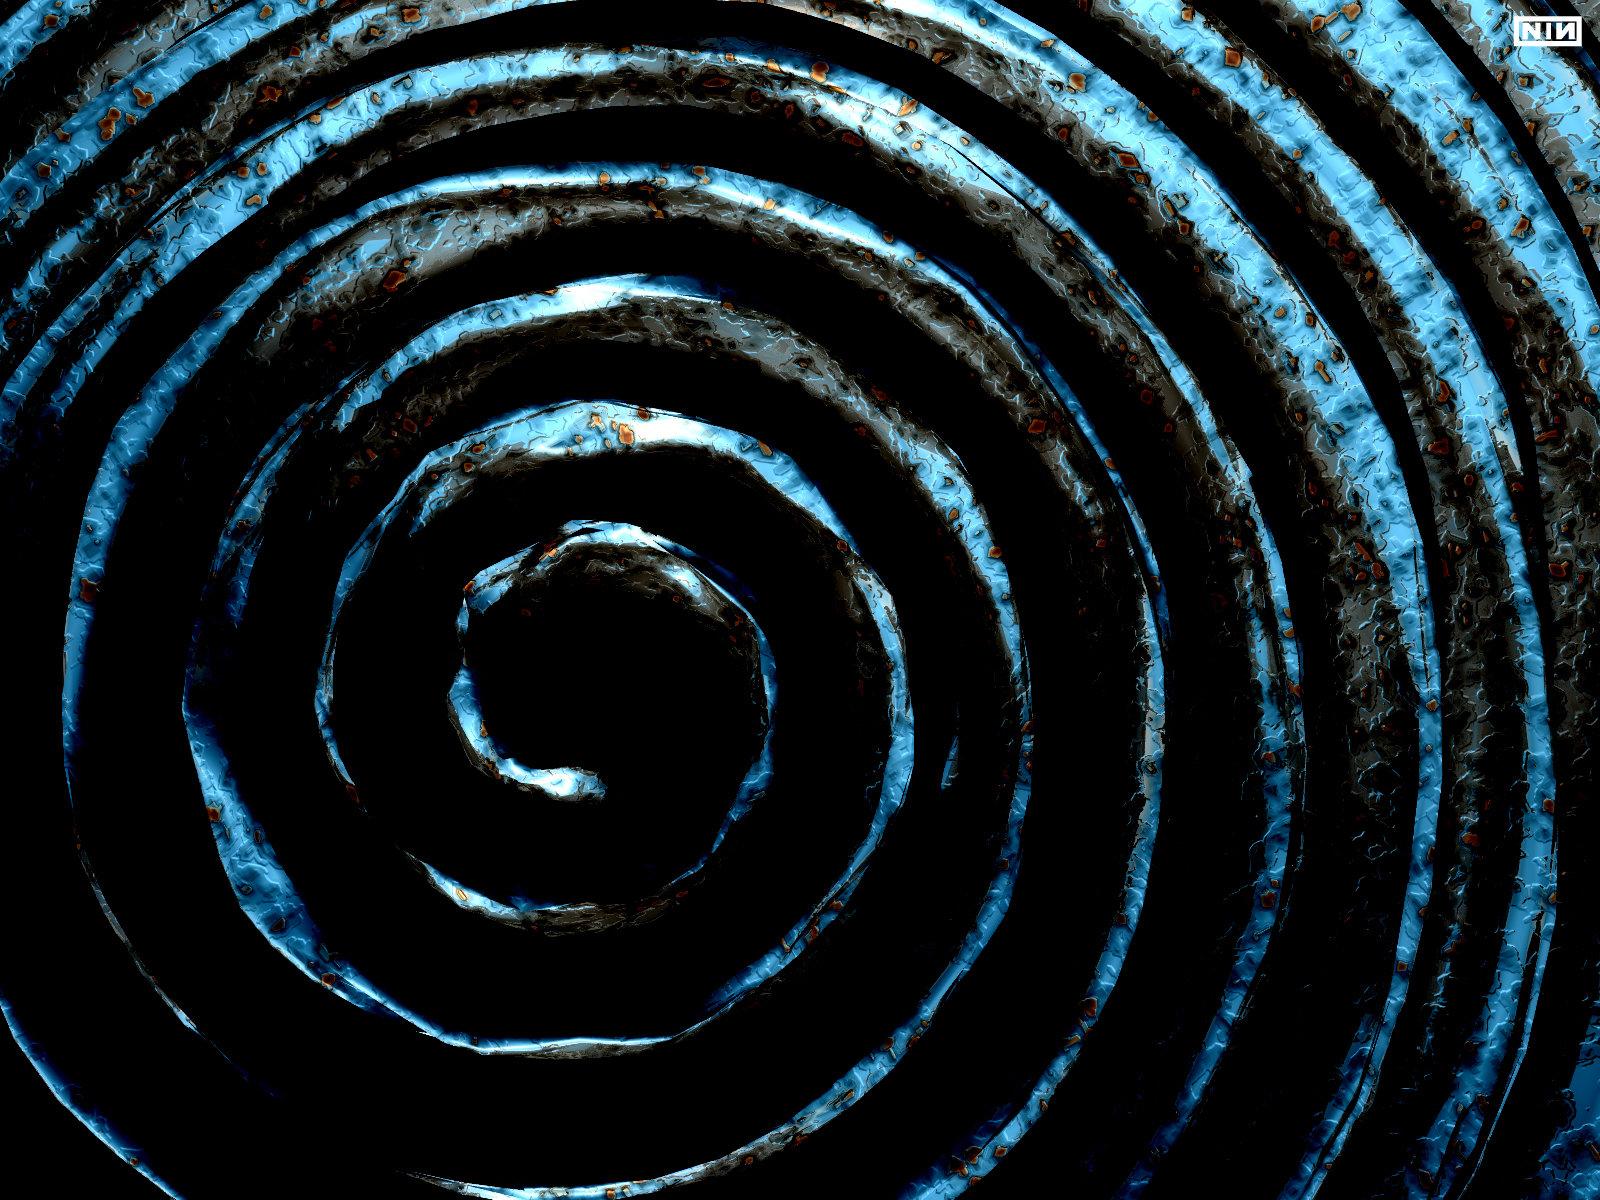 NIN spiral-1 Wallpaper by TDBK on DeviantArt